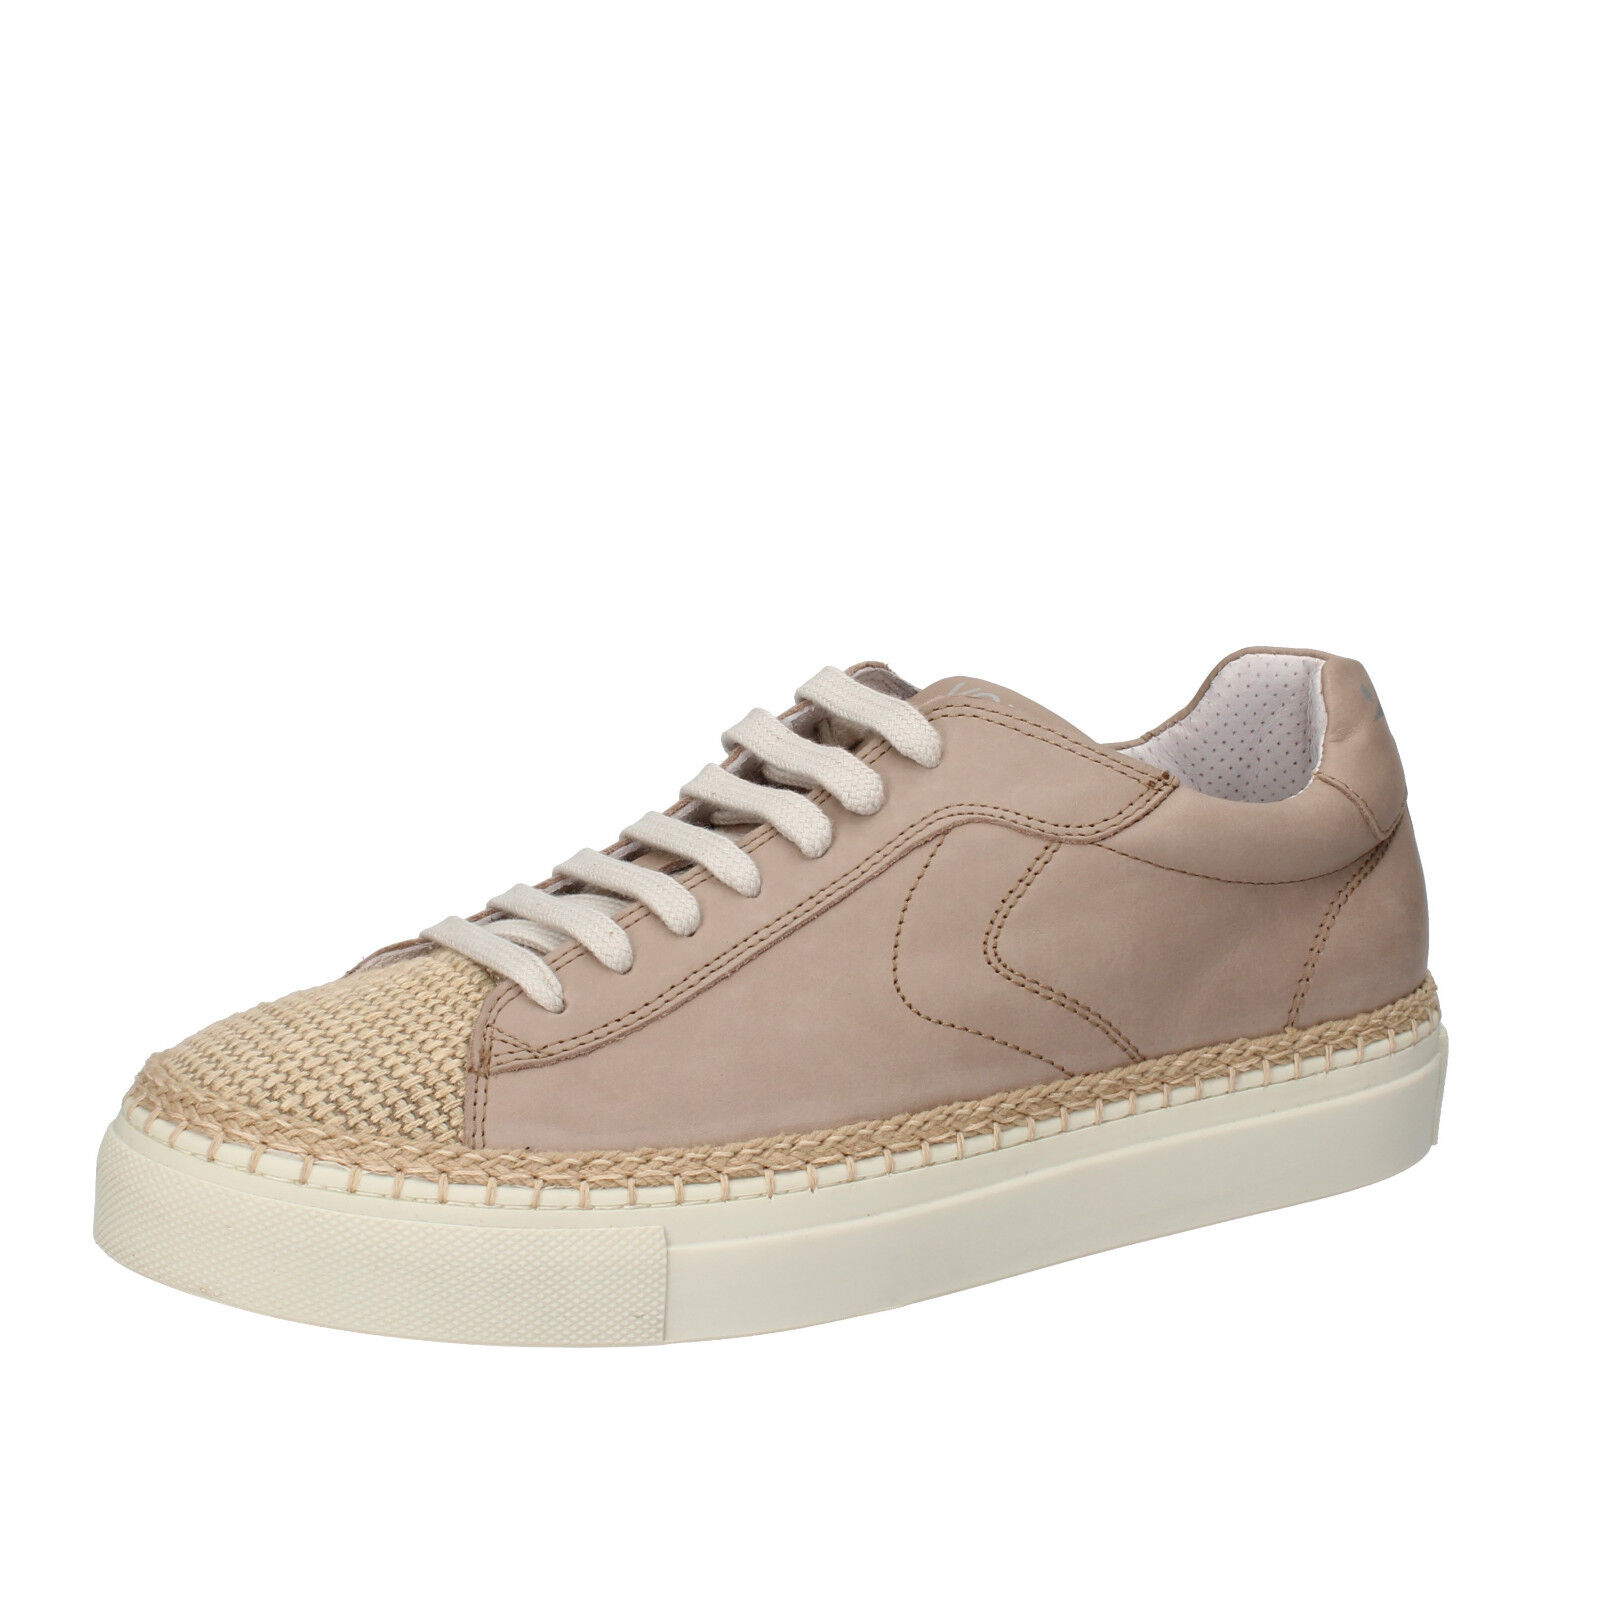 Mens shoes VOILE whiteHE 7 (EU 41) Sneakers beige leather Textile AC600-D